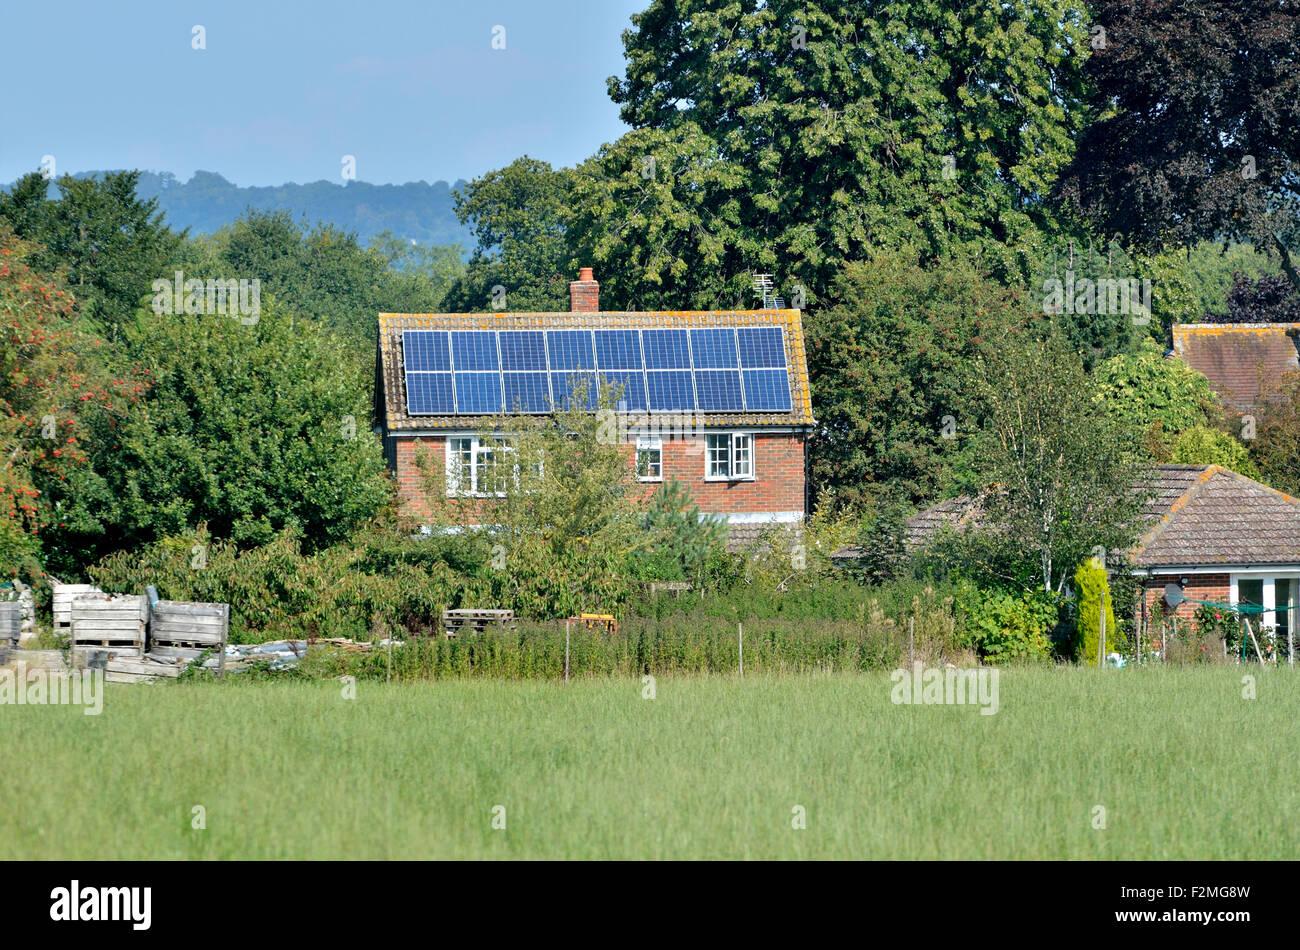 Boughton Monchelsea village, Maidstone, Kent, UK. Paneles solares en una casa rural Imagen De Stock